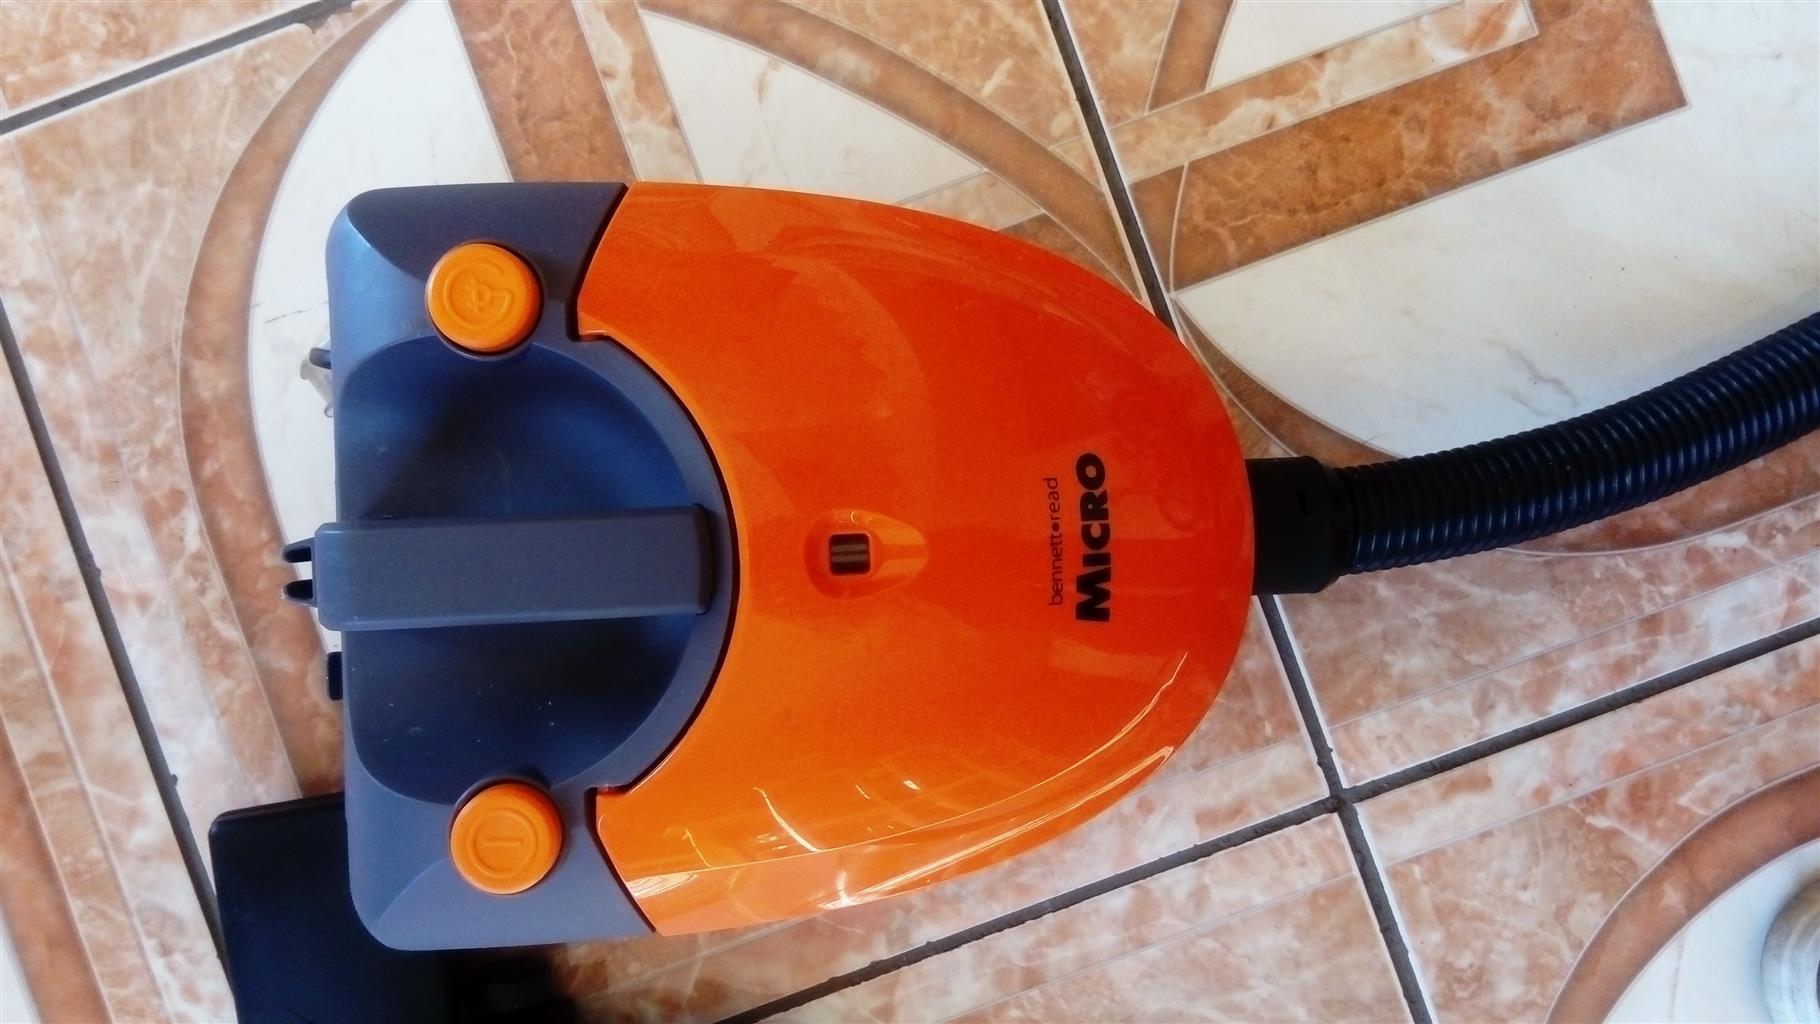 Bennet read vacuum cleaner 1000 watts